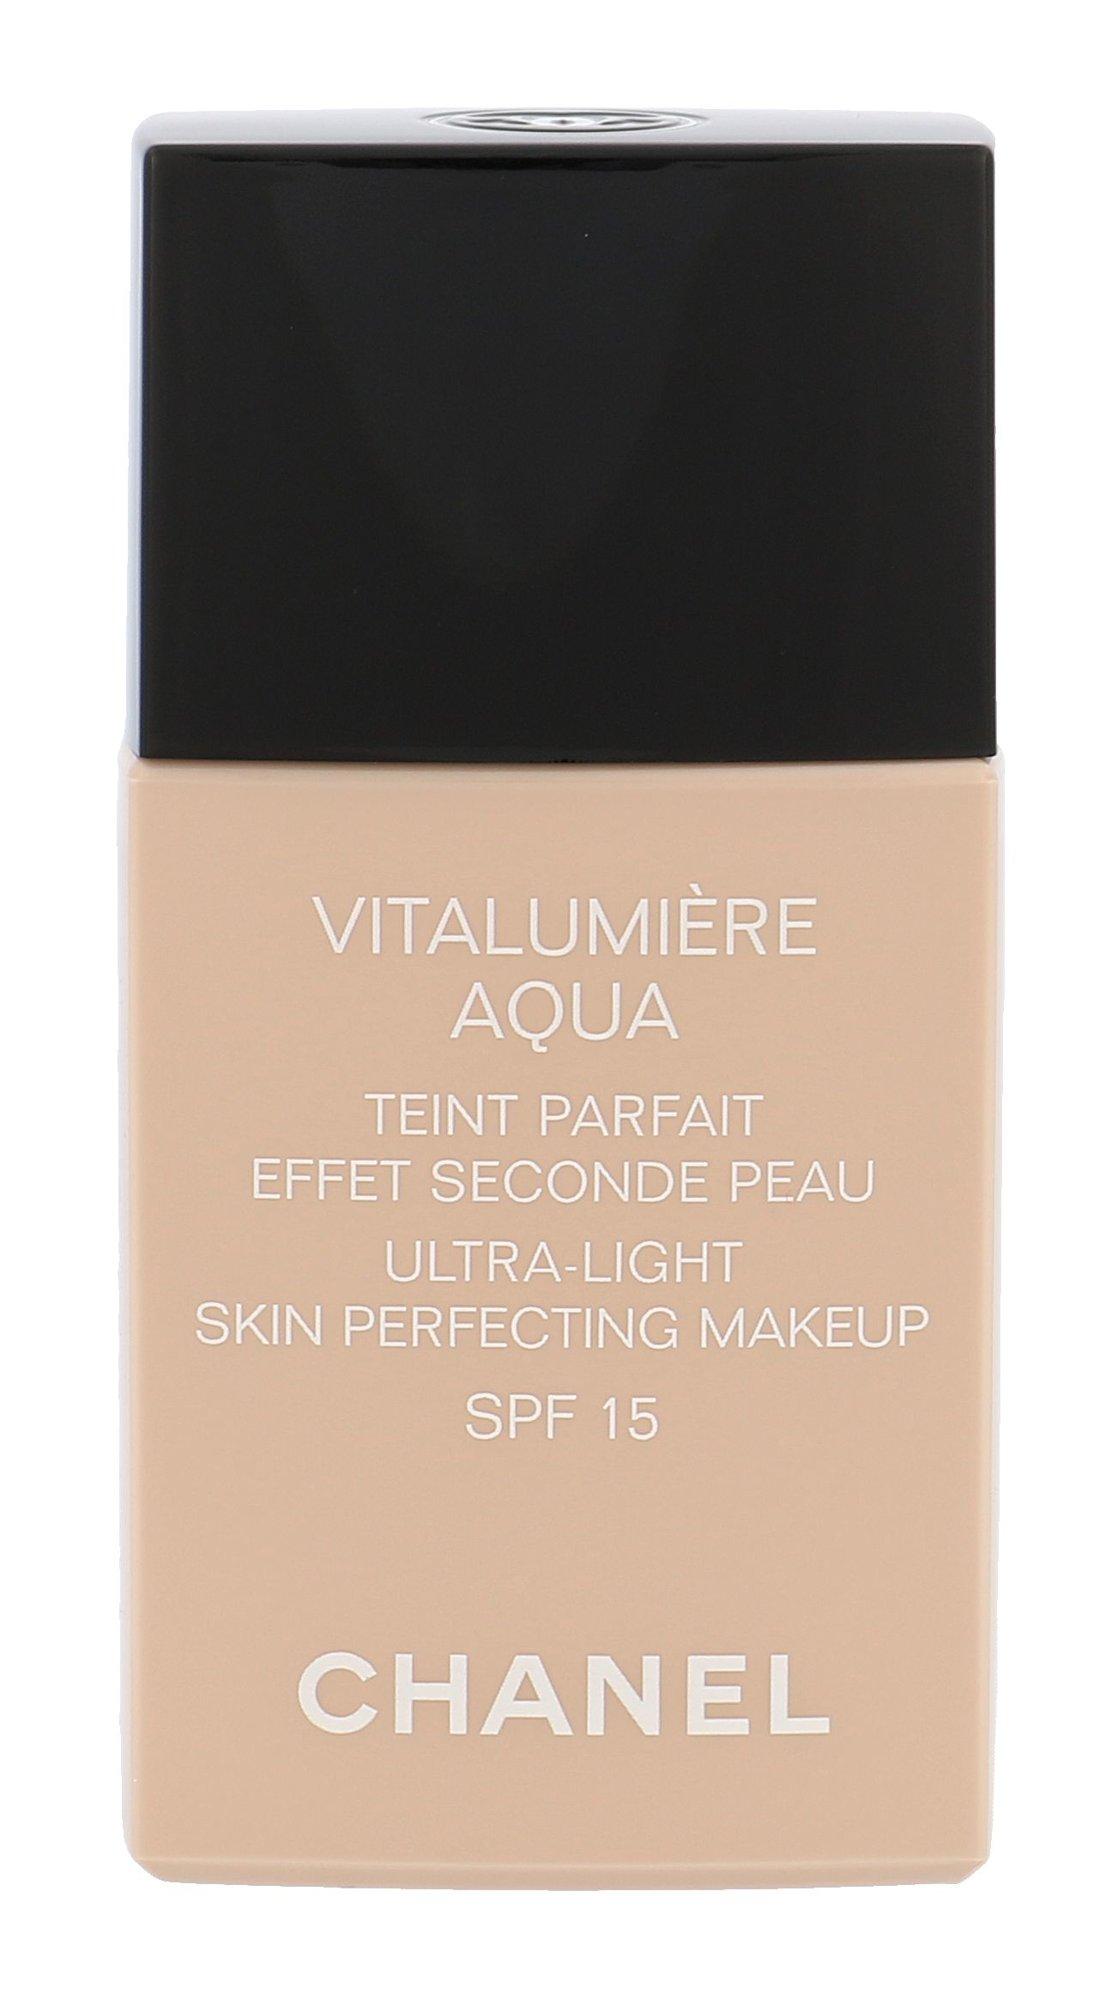 Chanel Vitalumiere Aqua Cosmetic 30ml 22 Beige Rosé